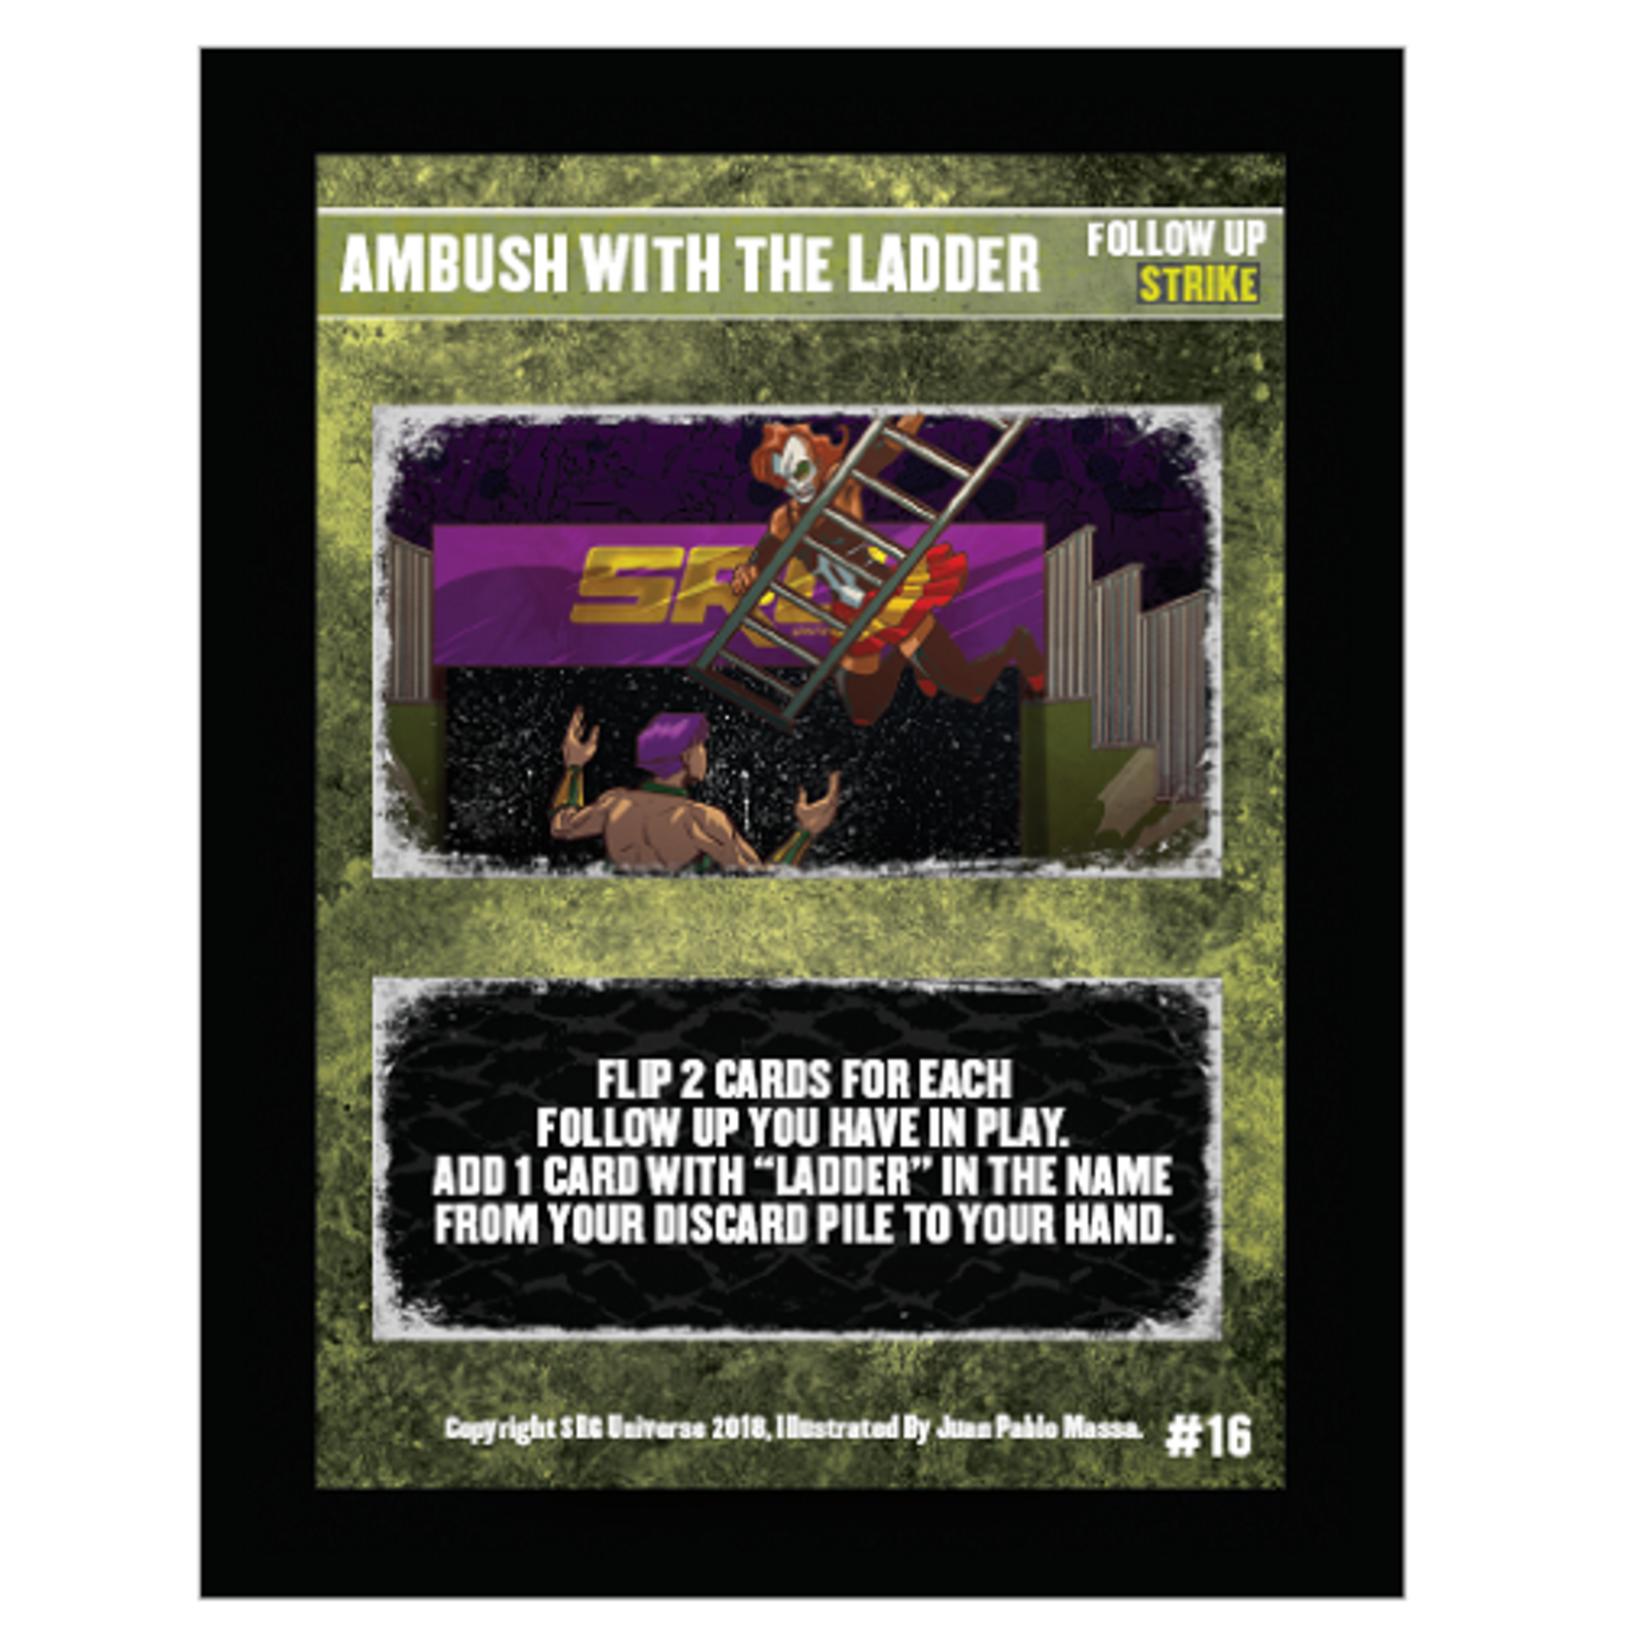 SRG Ambush With The Ladder